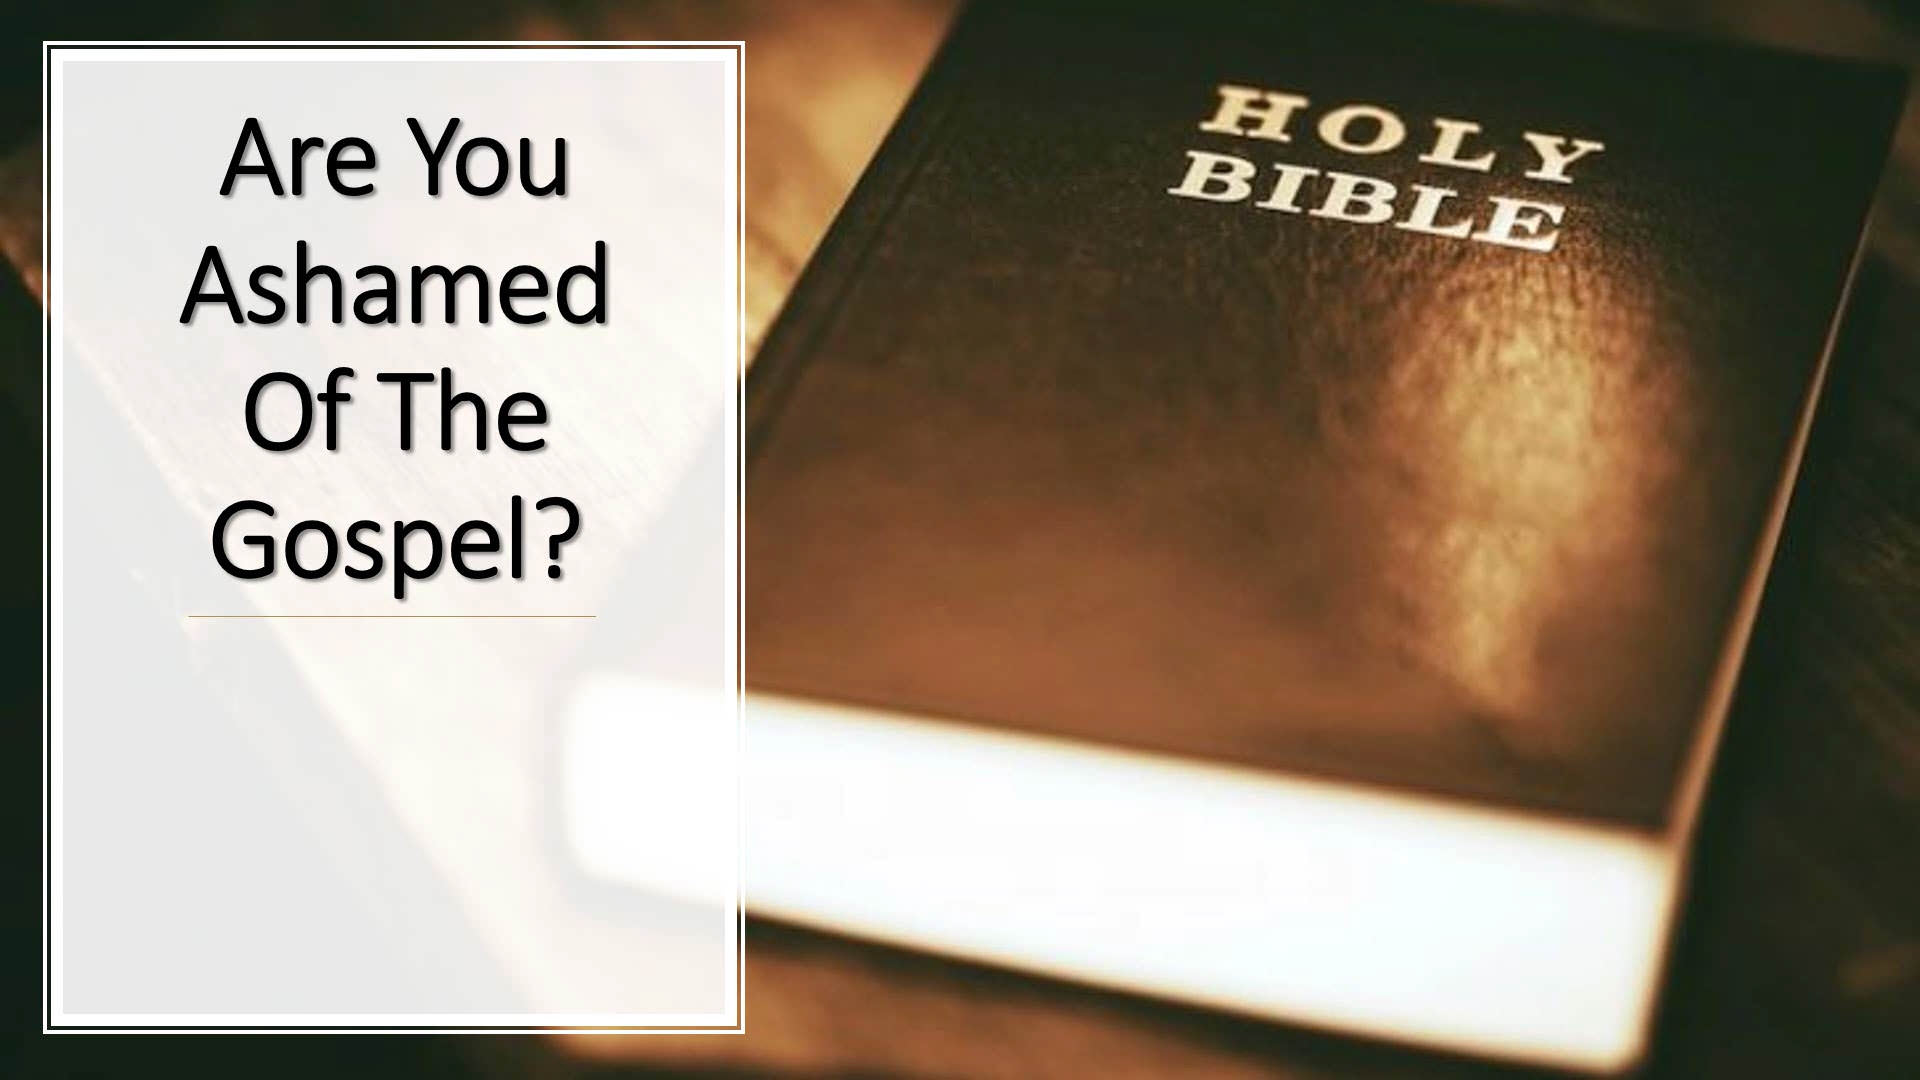 Are You Ashamed Of The Gospel?